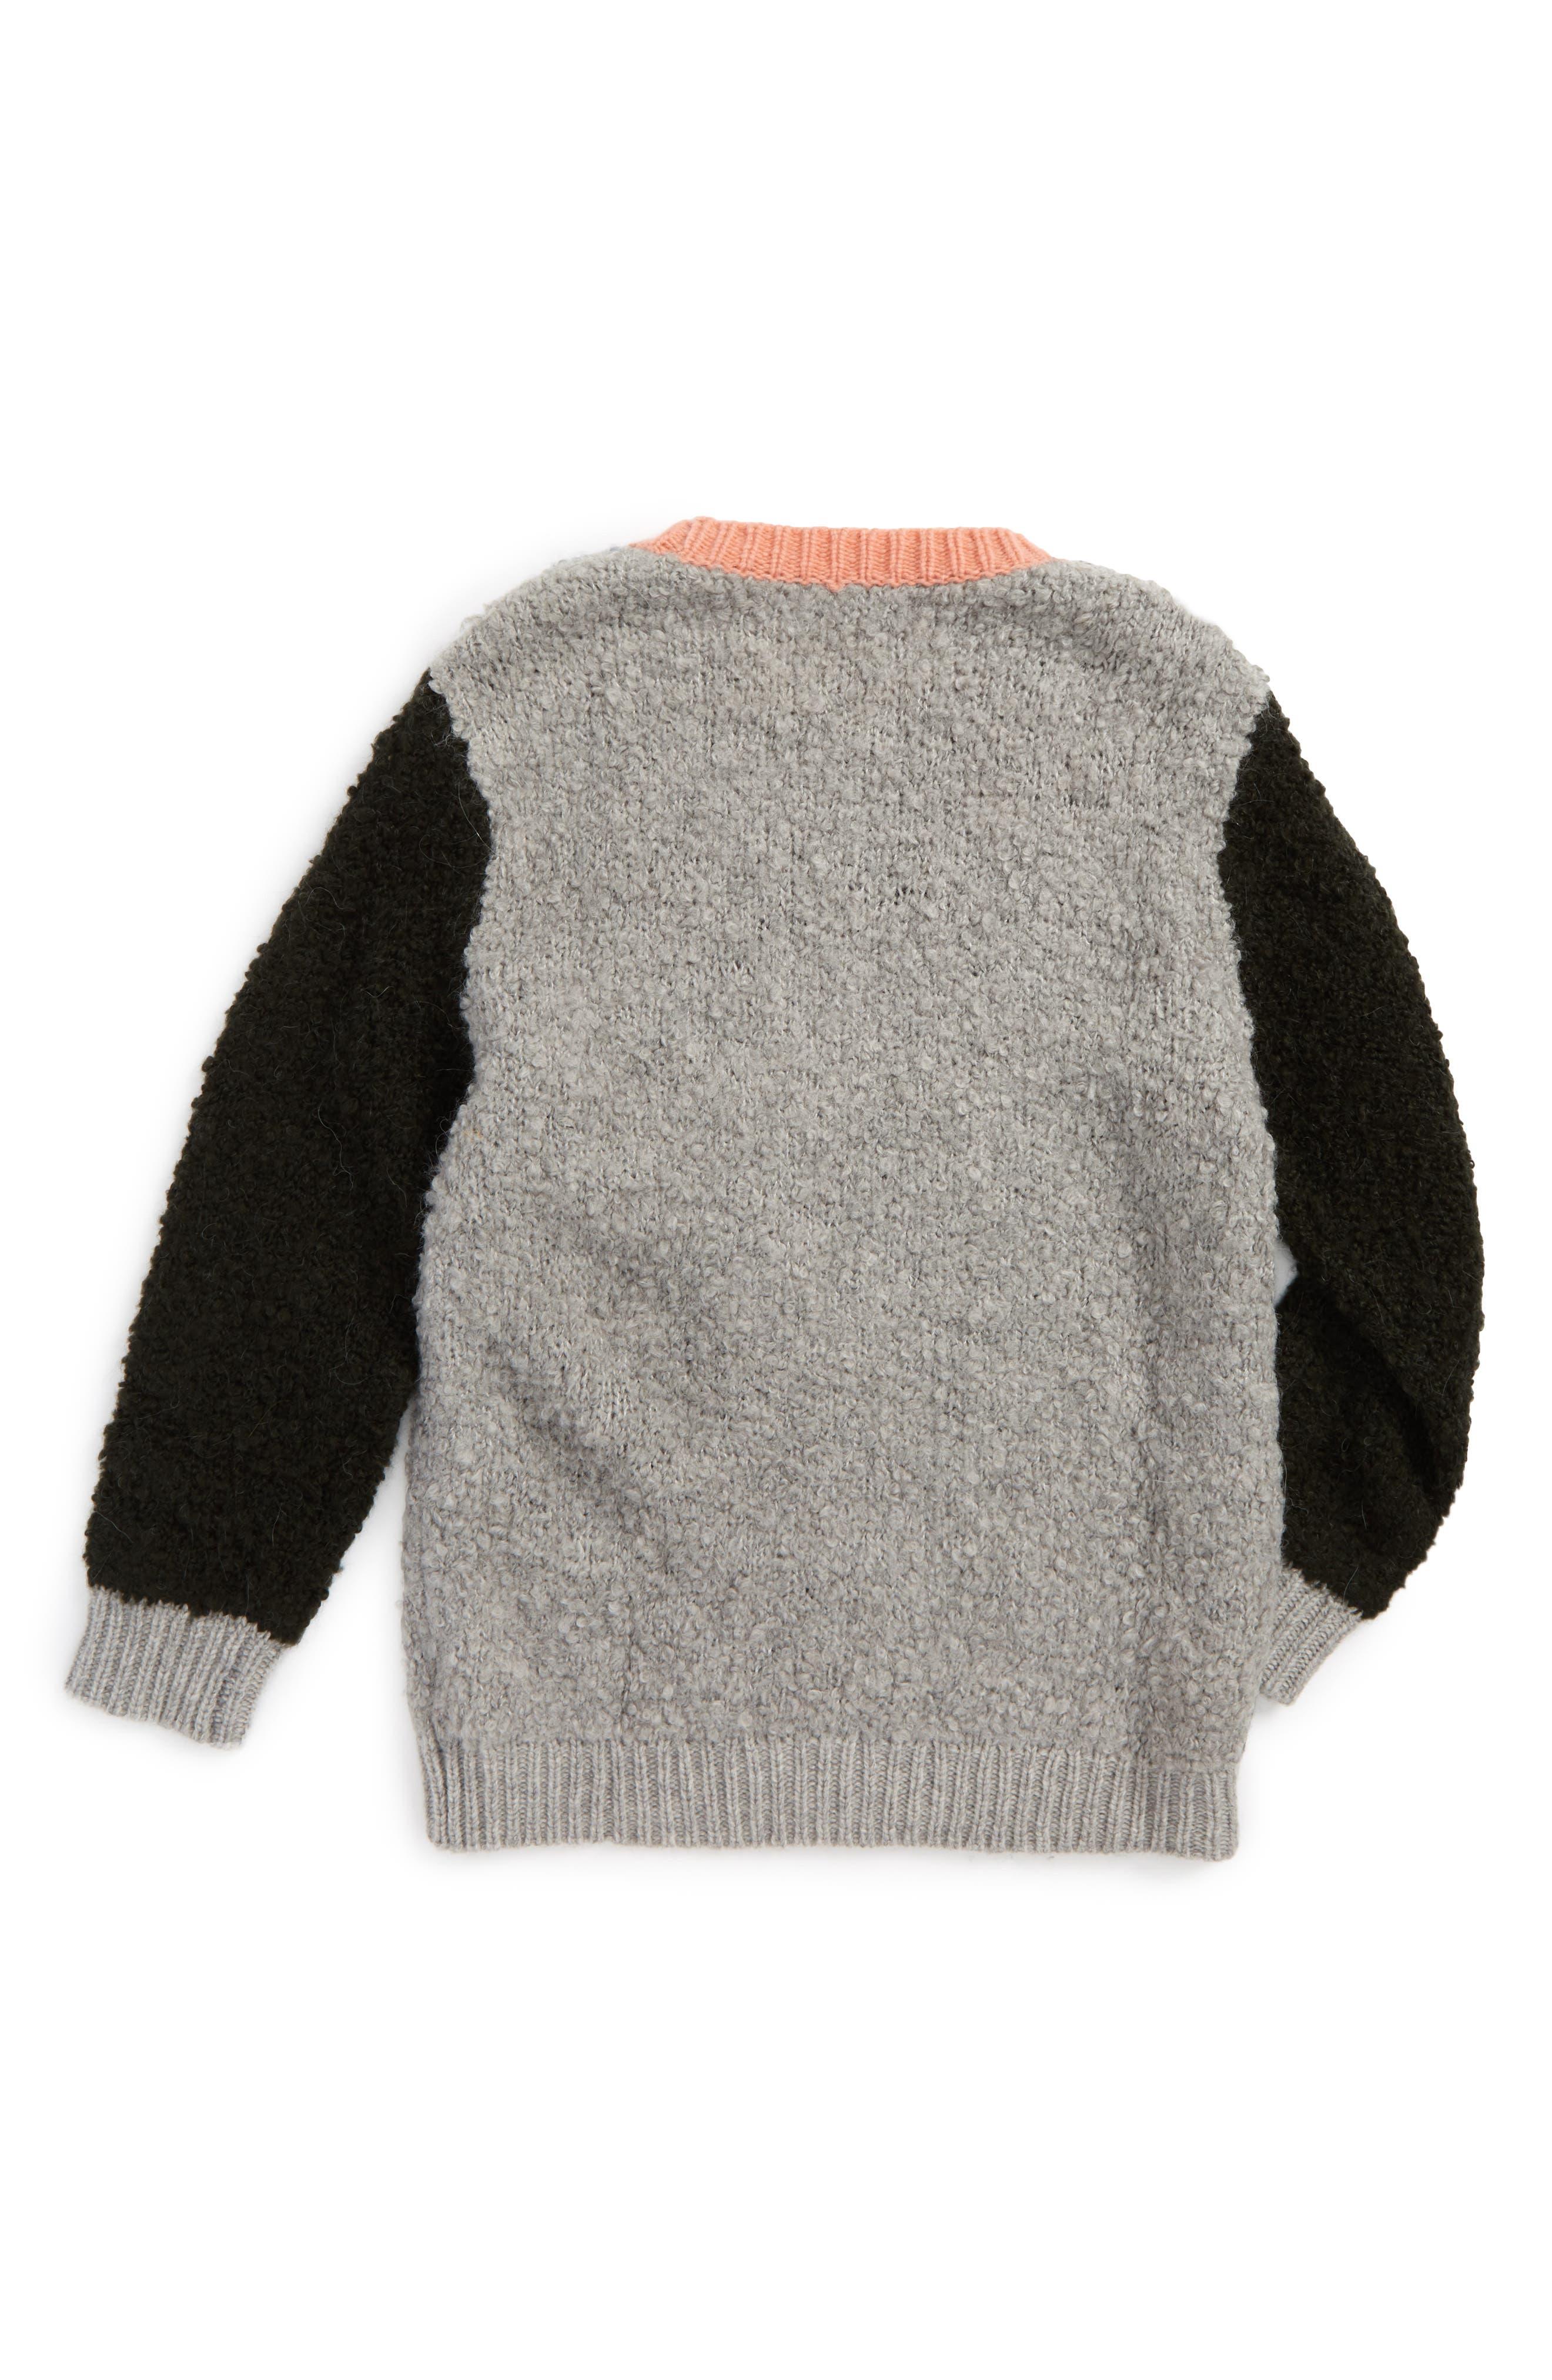 Kids Maya Colorblock Sweater,                             Alternate thumbnail 2, color,                             060